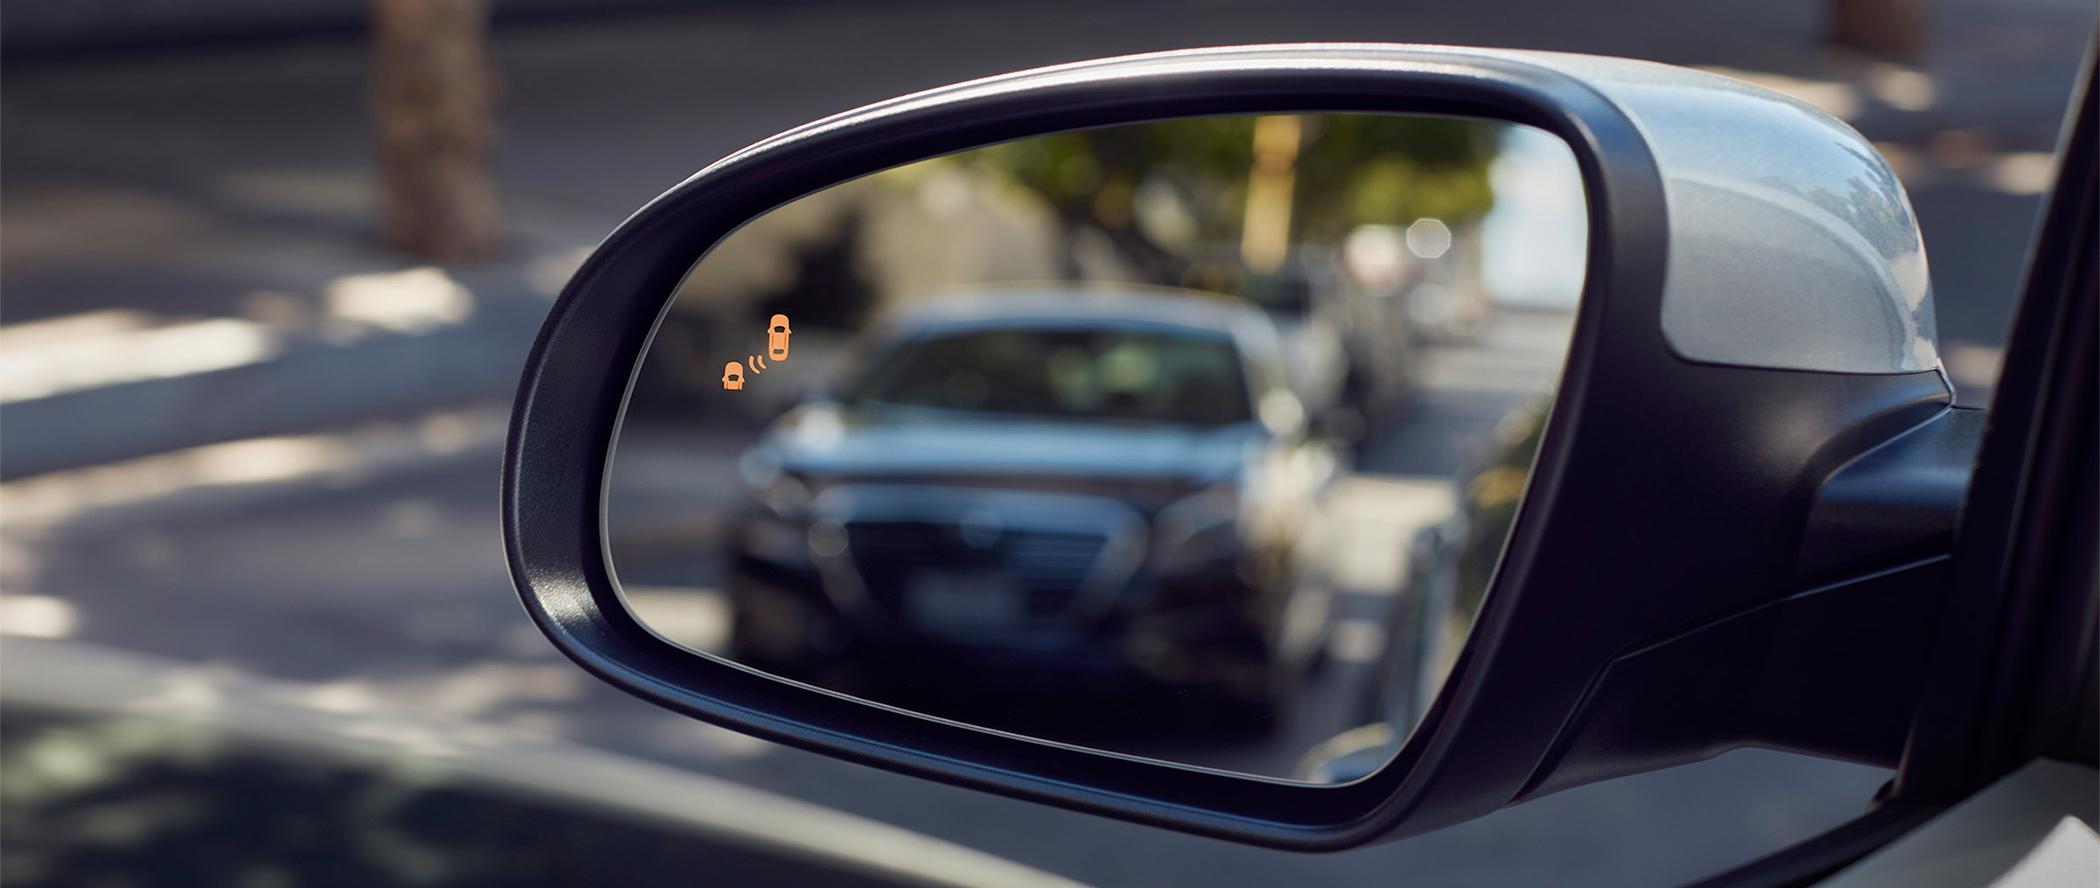 Safety and Technology of the 2019 Hyundai Kona